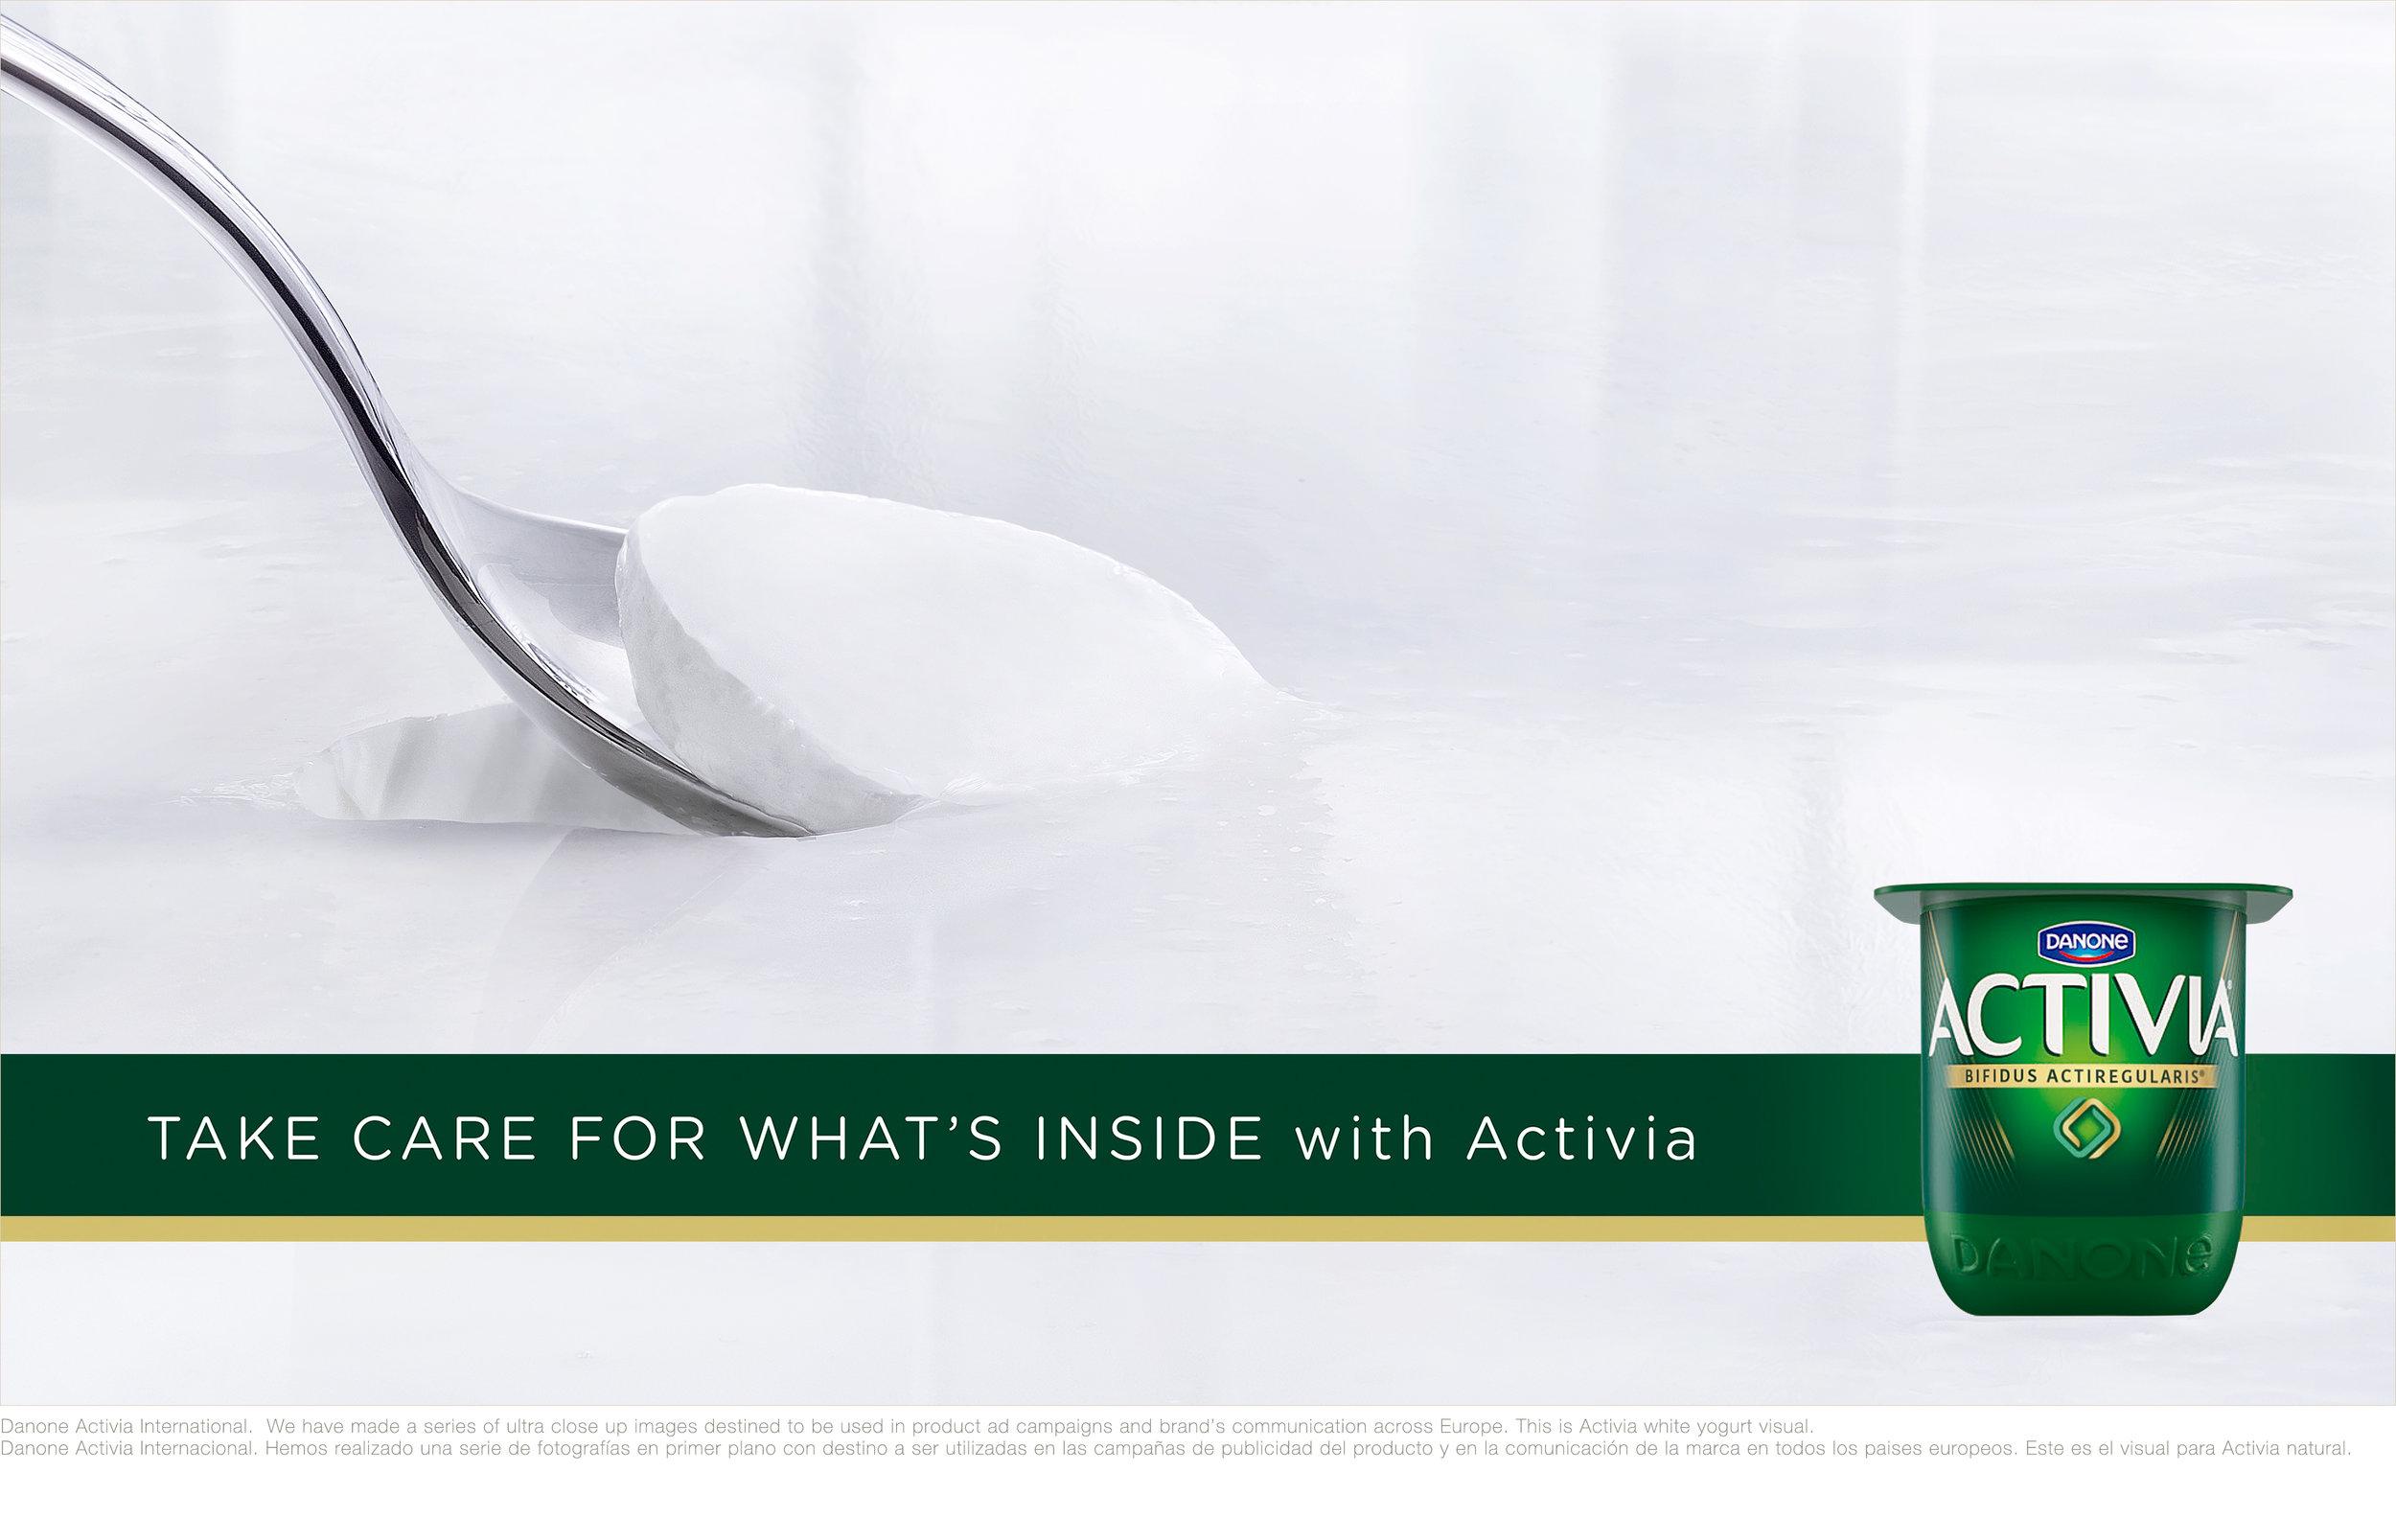 1723a-Activia-INT-SET-White-Wide-01.jpg